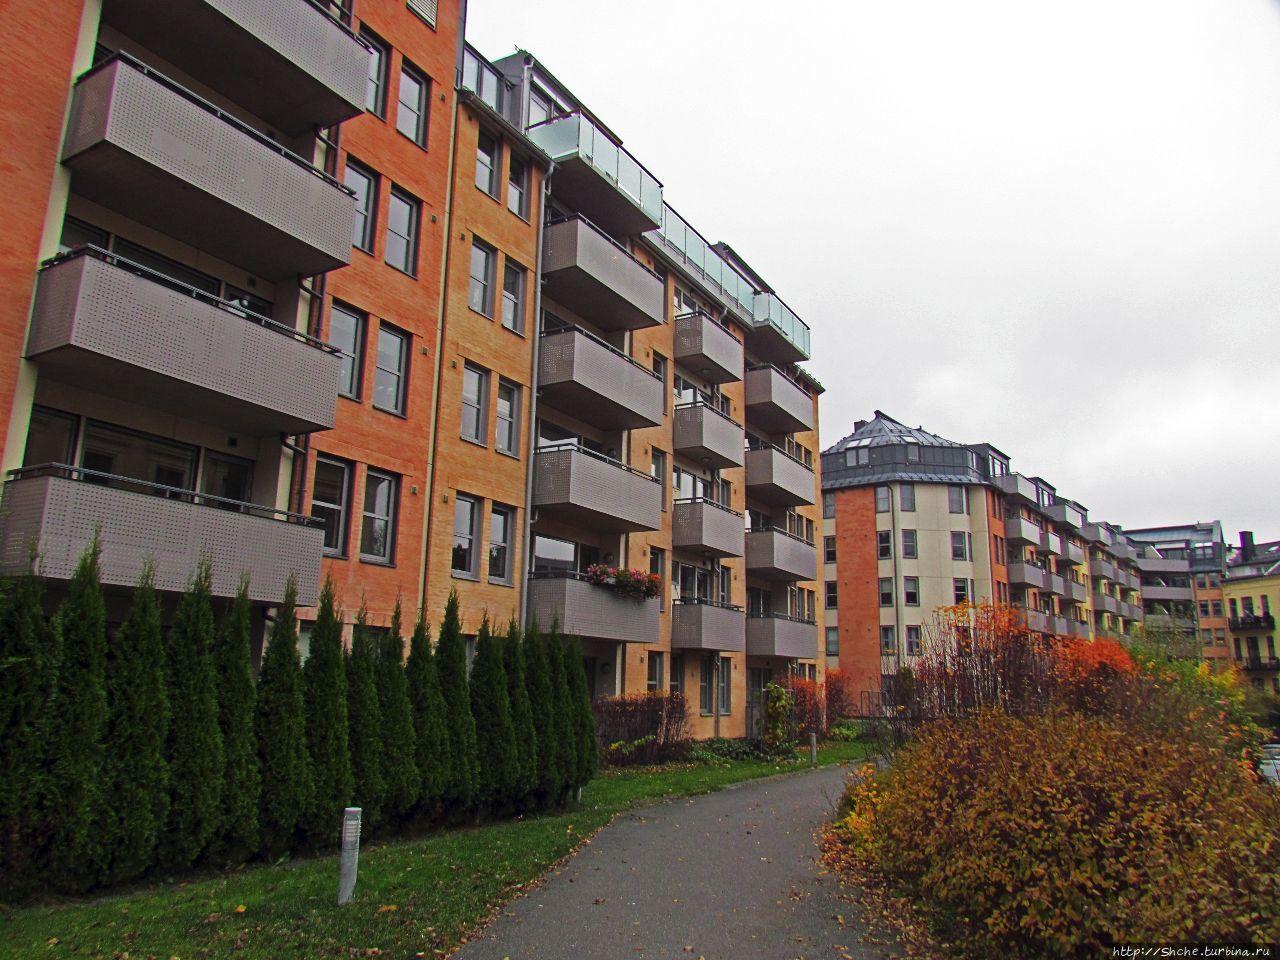 район Фрогнер Осло, Норвегия